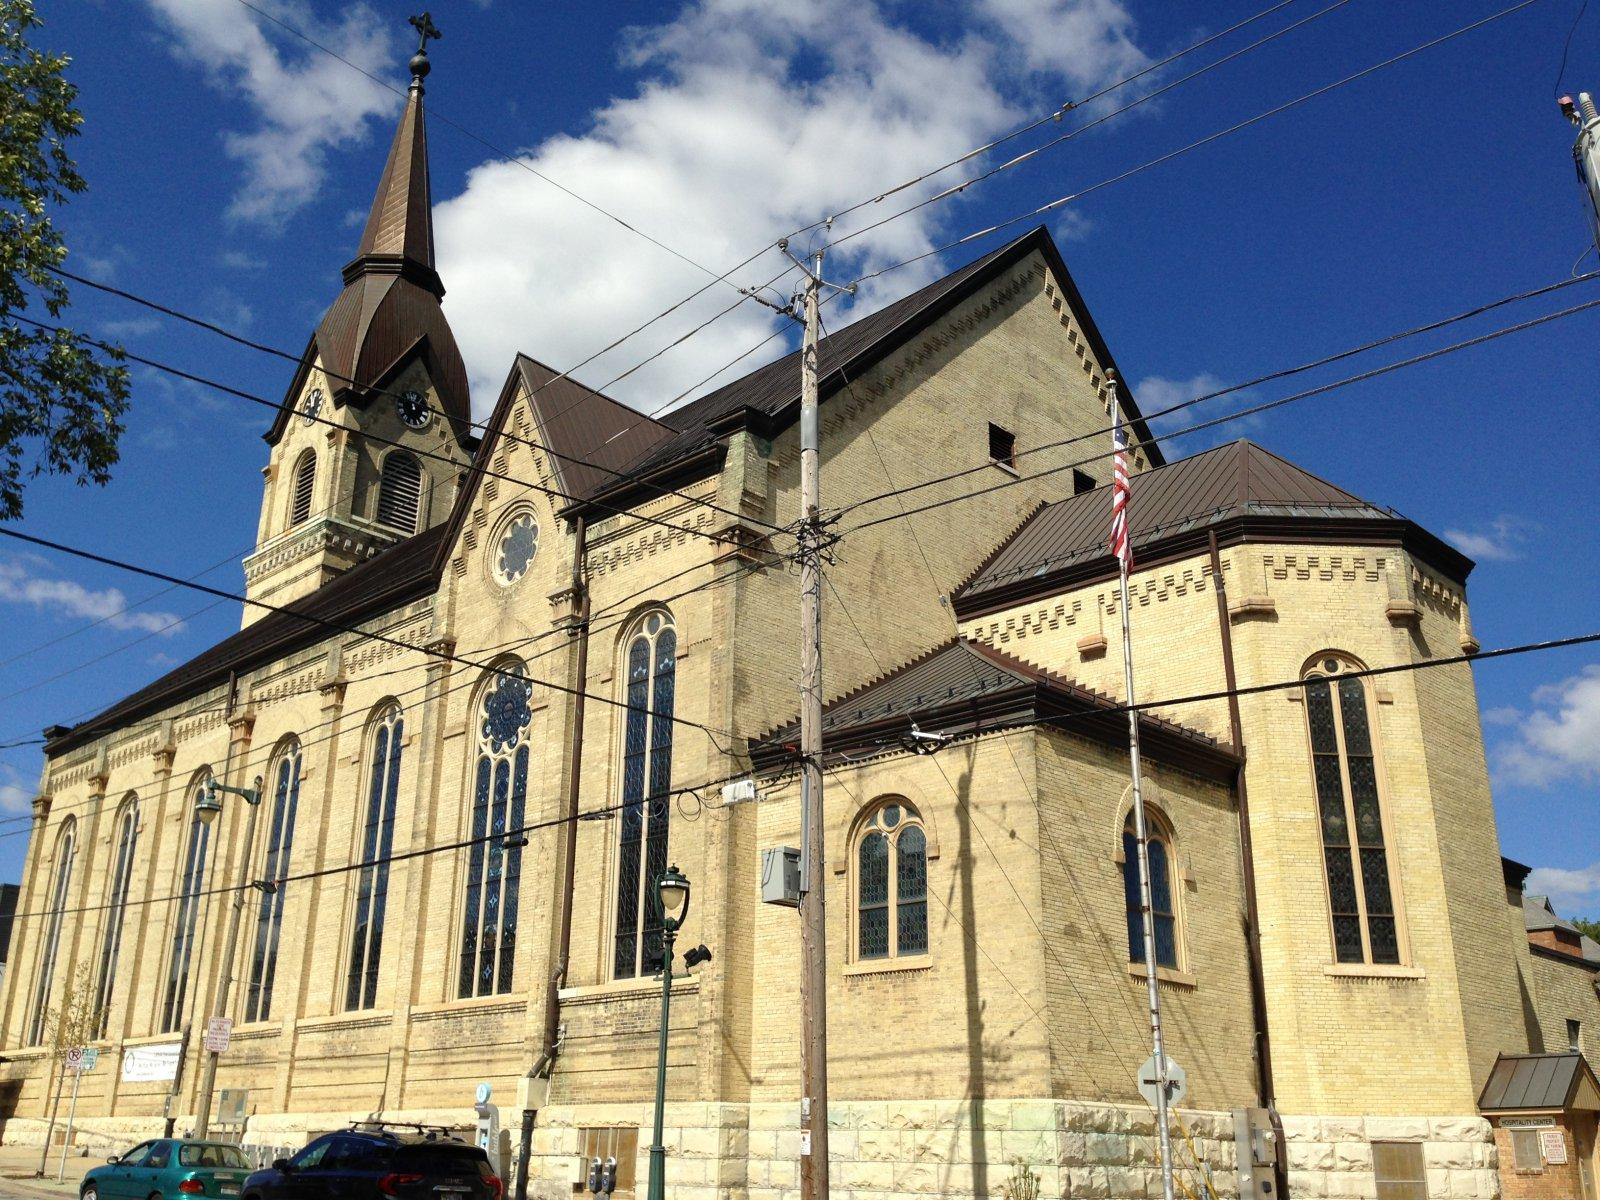 St. Hedwig Catholic Church, 1704-1716 N. Humboldt Ave